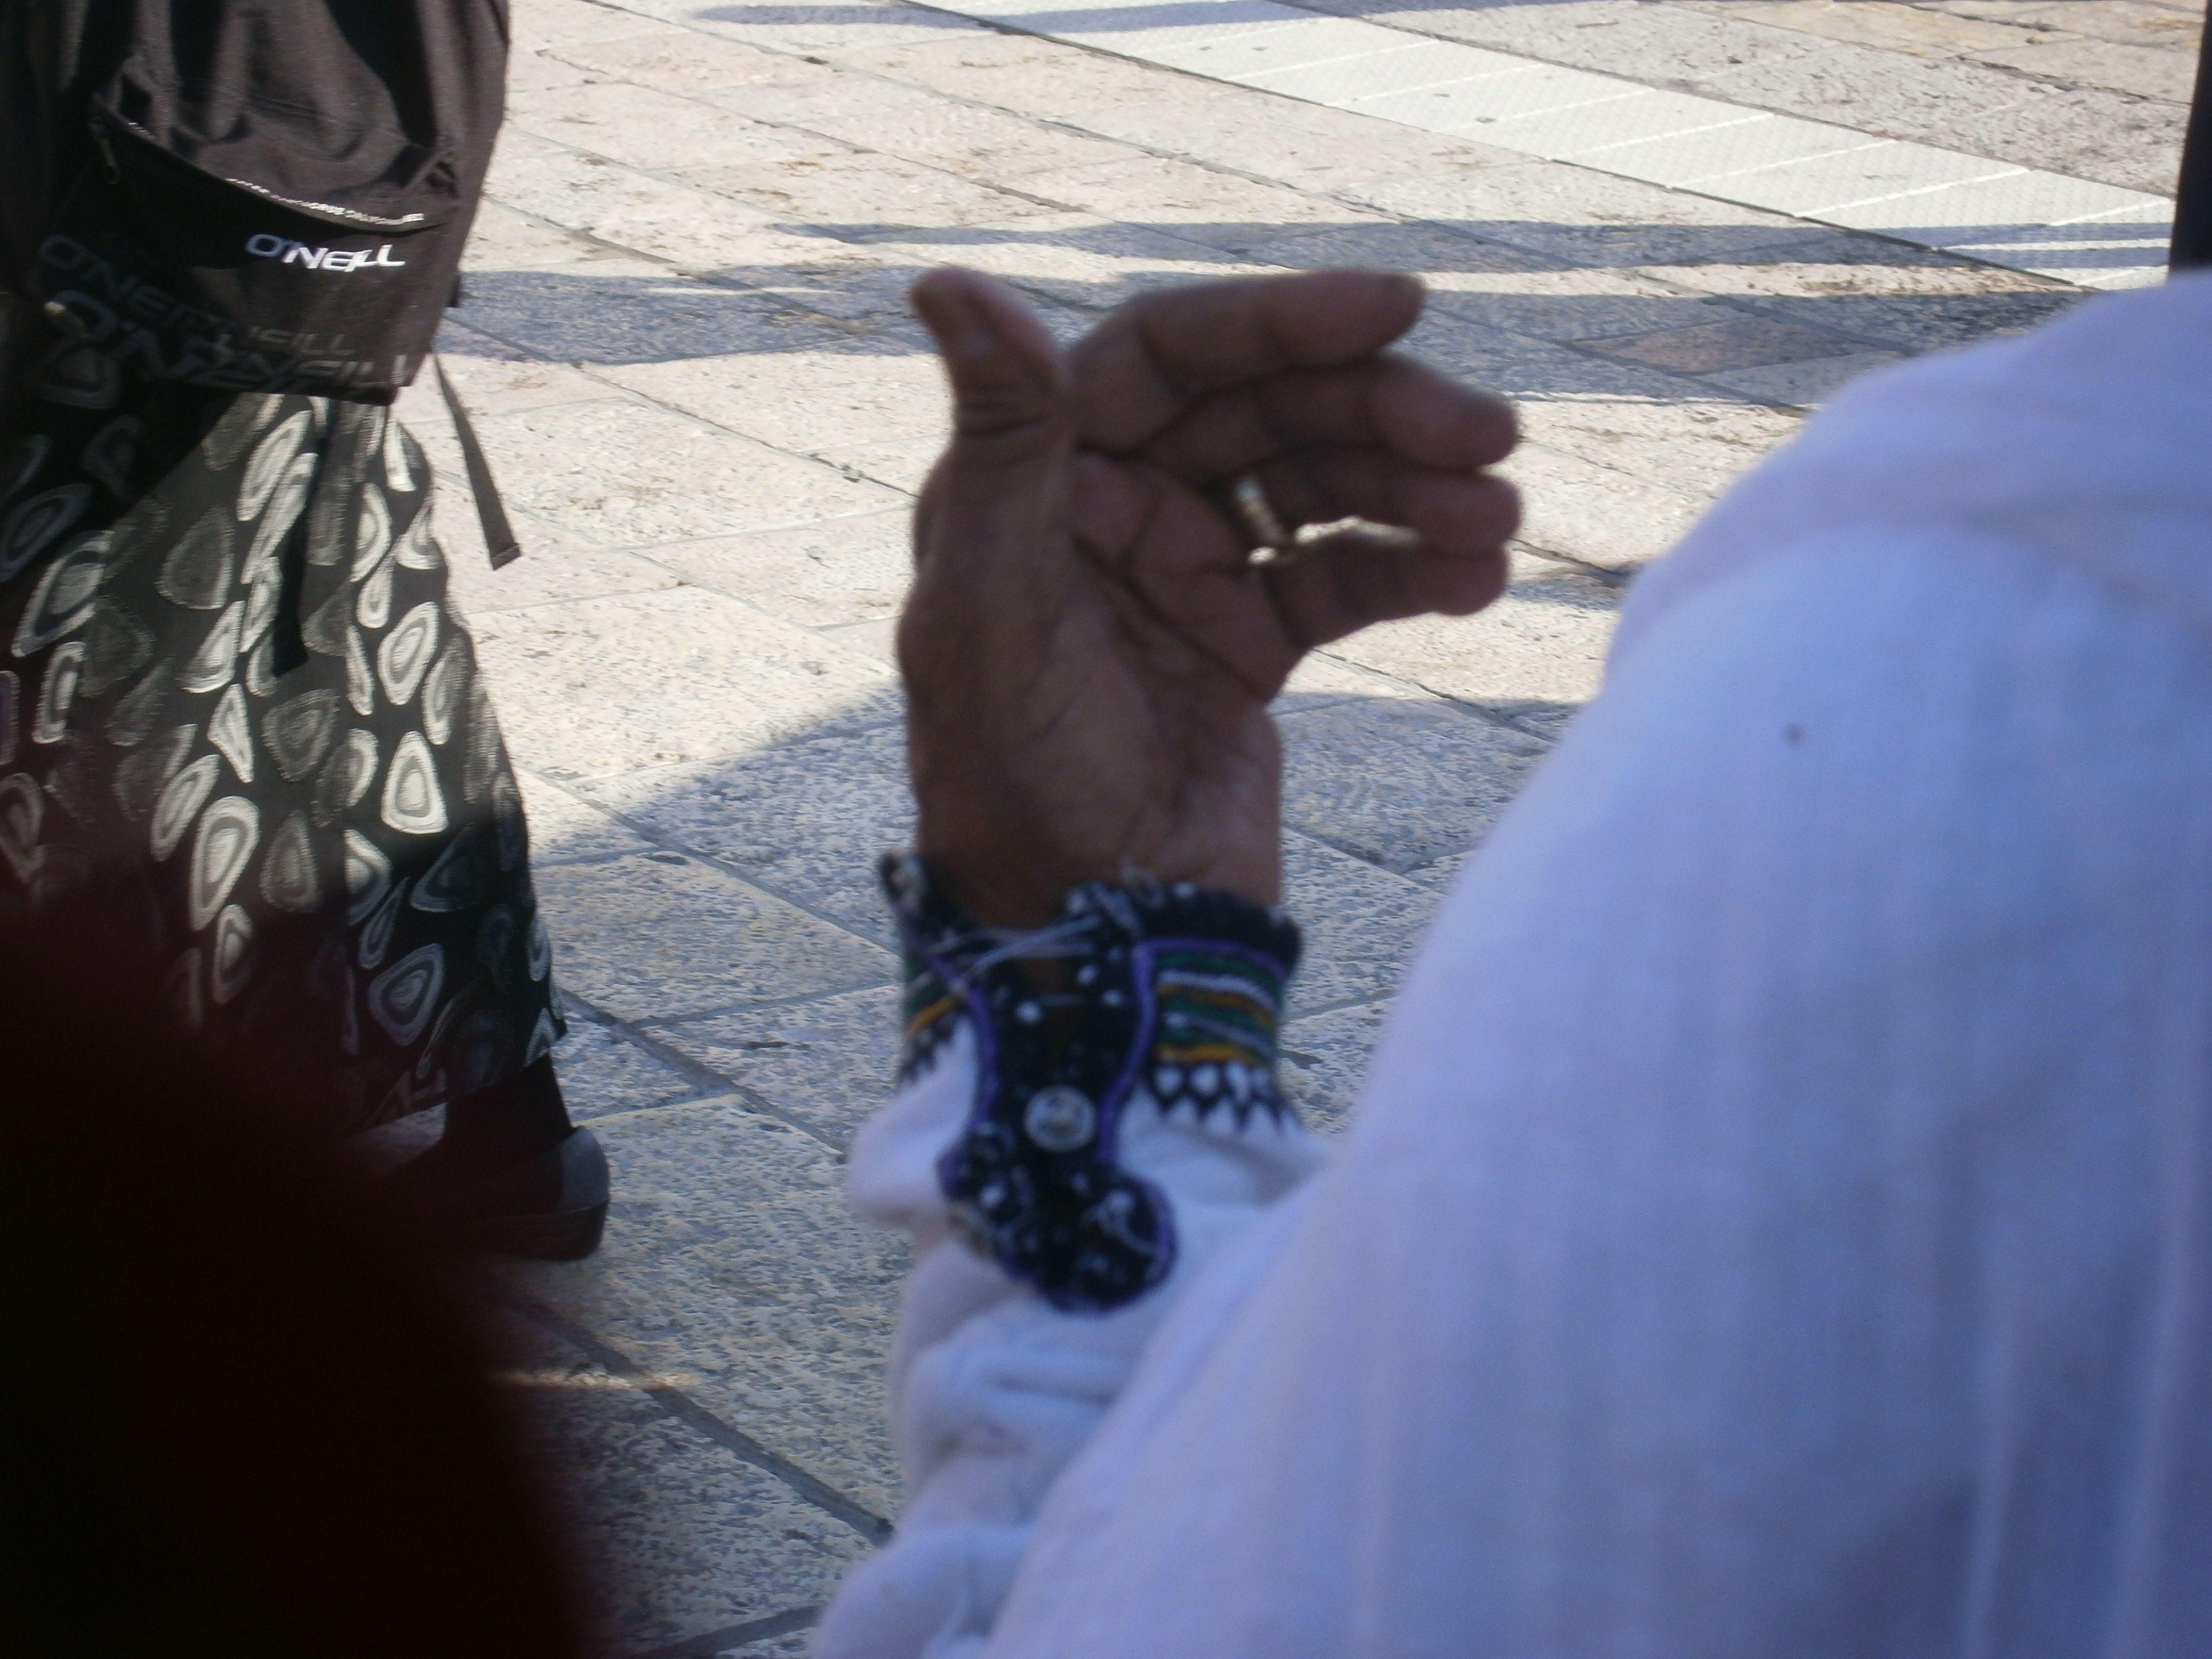 the hand of an elderly Ethiopian woman praying at the Western Wall during Bircat Kohanim Succot.